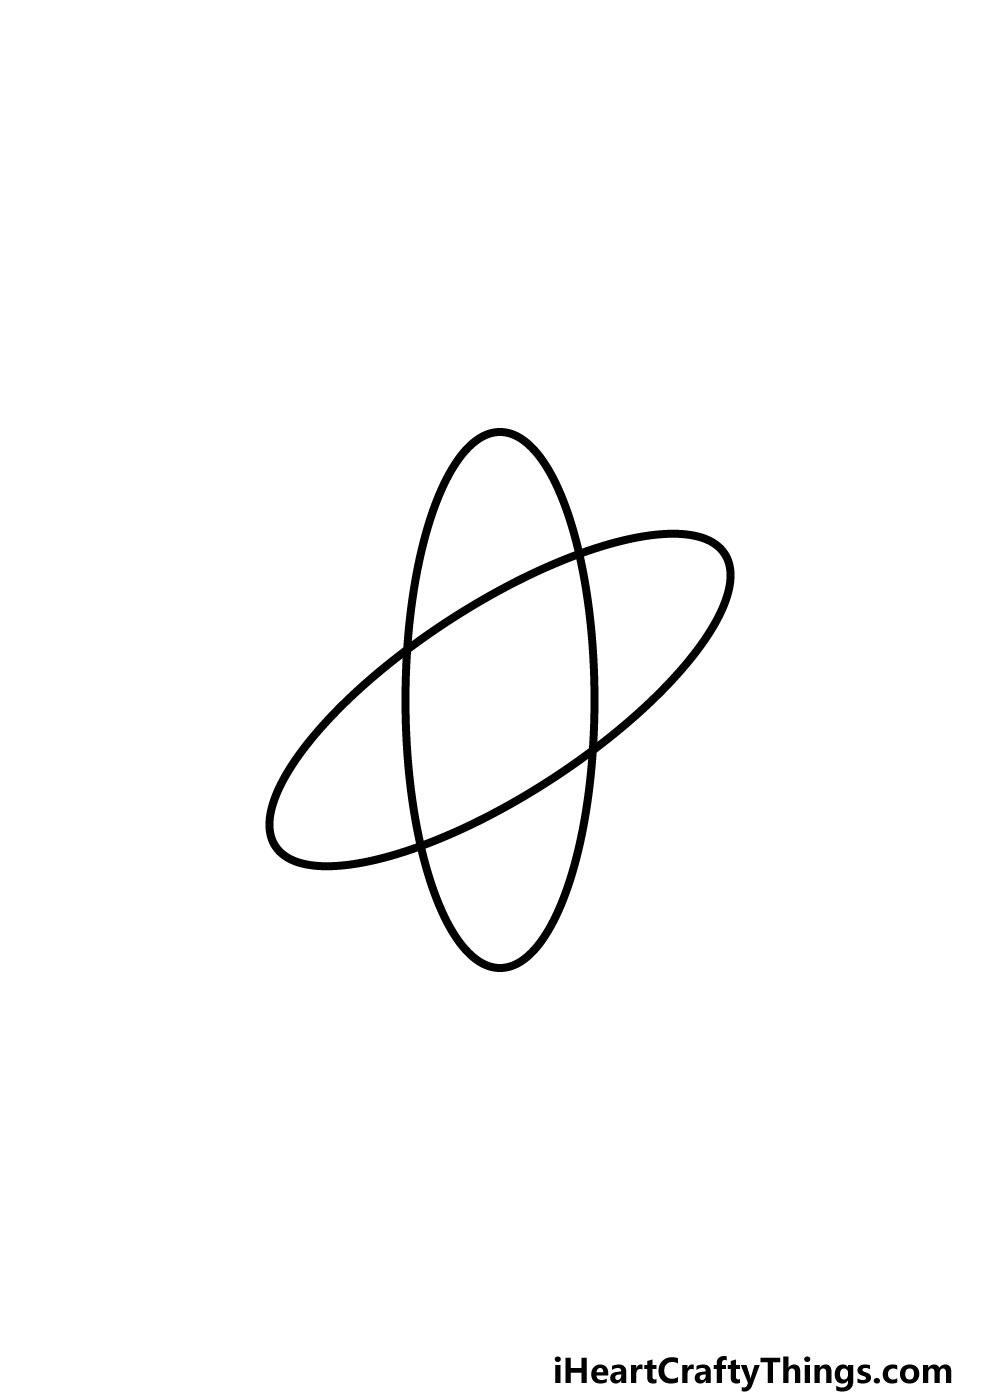 drawing an atom step 2